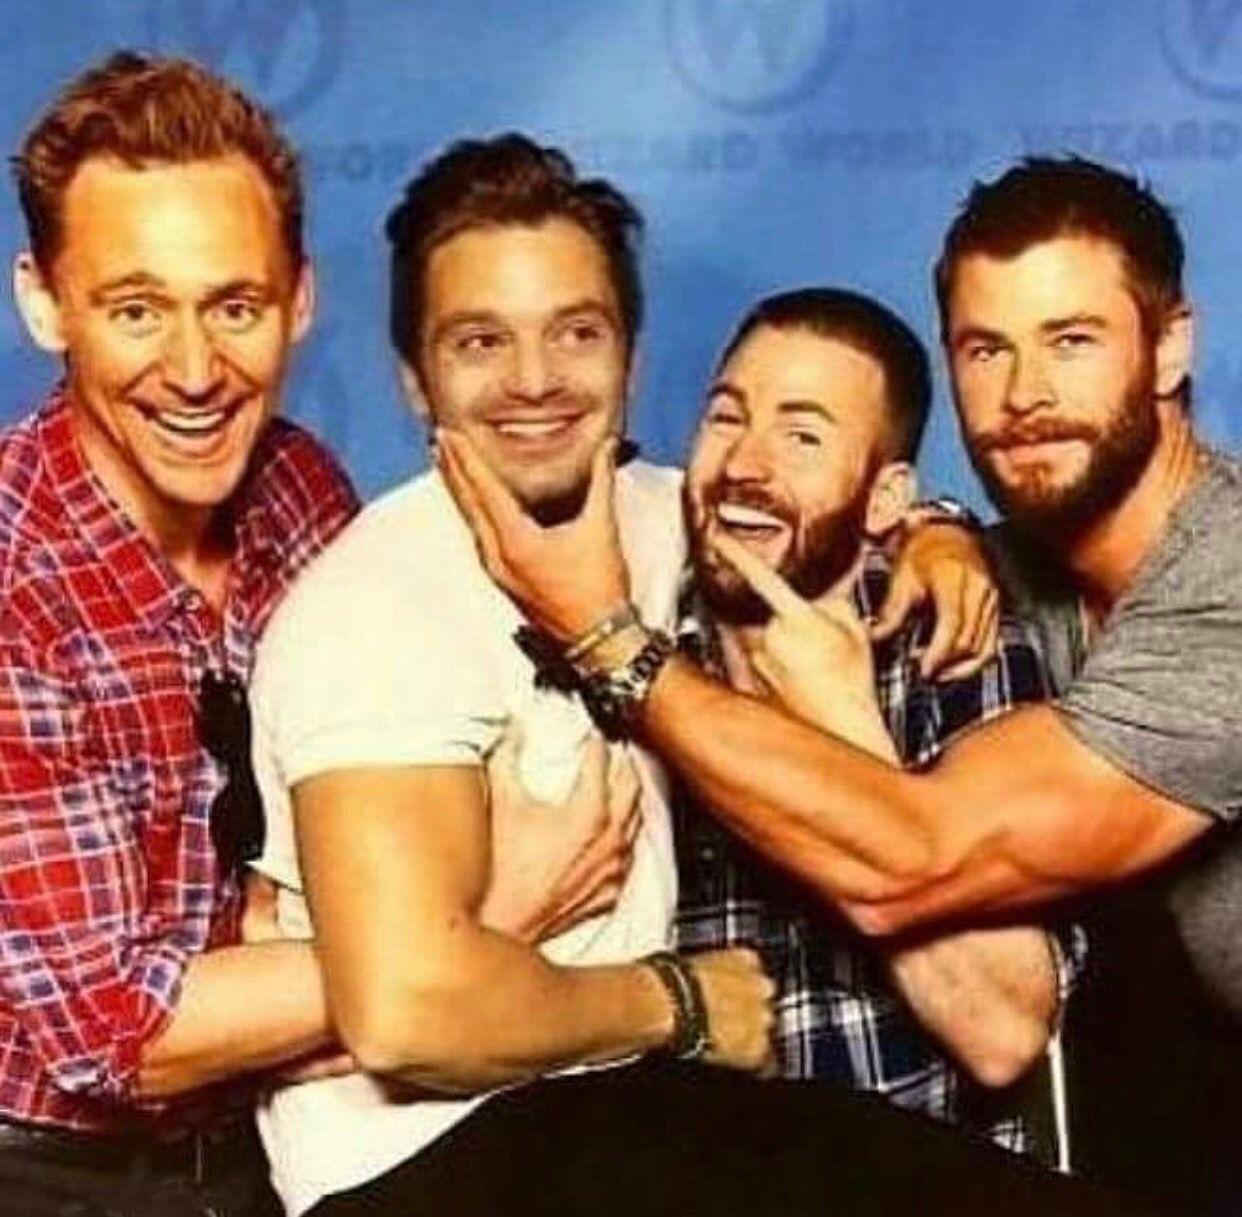 Tom Hiddleston, Sebastian Stan, Chris Evans and Chris Hemsworth WAS THIS A DOUBLE DATE?!xD